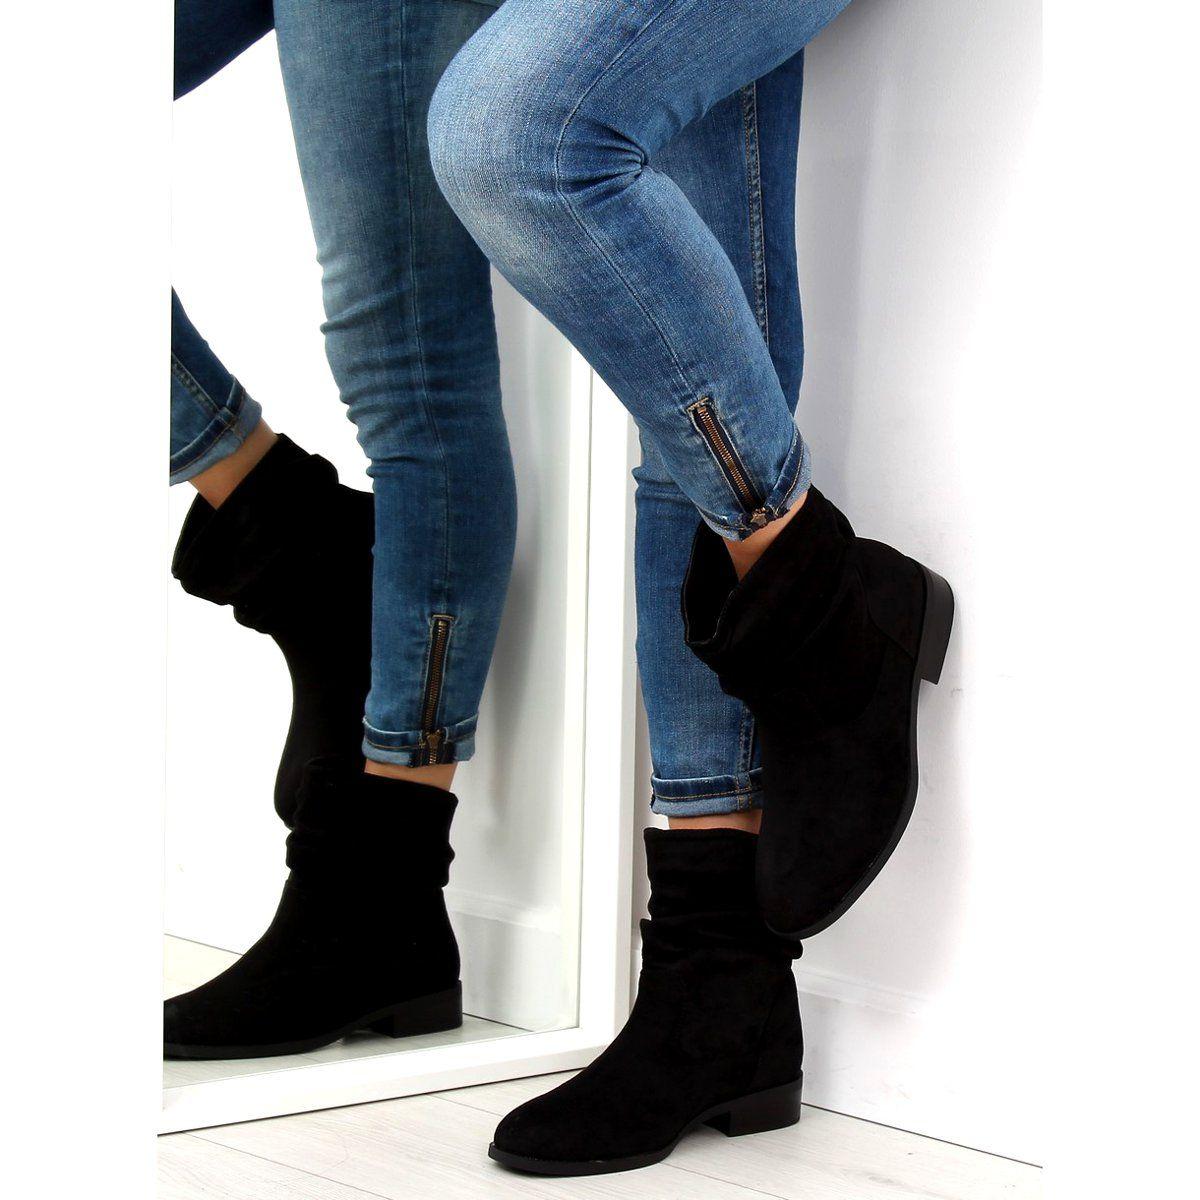 Botki Damskie Butymodne Botki Damskie Saszki Czarne 1126 Pa Black Skinny Jeans Boots Fashion